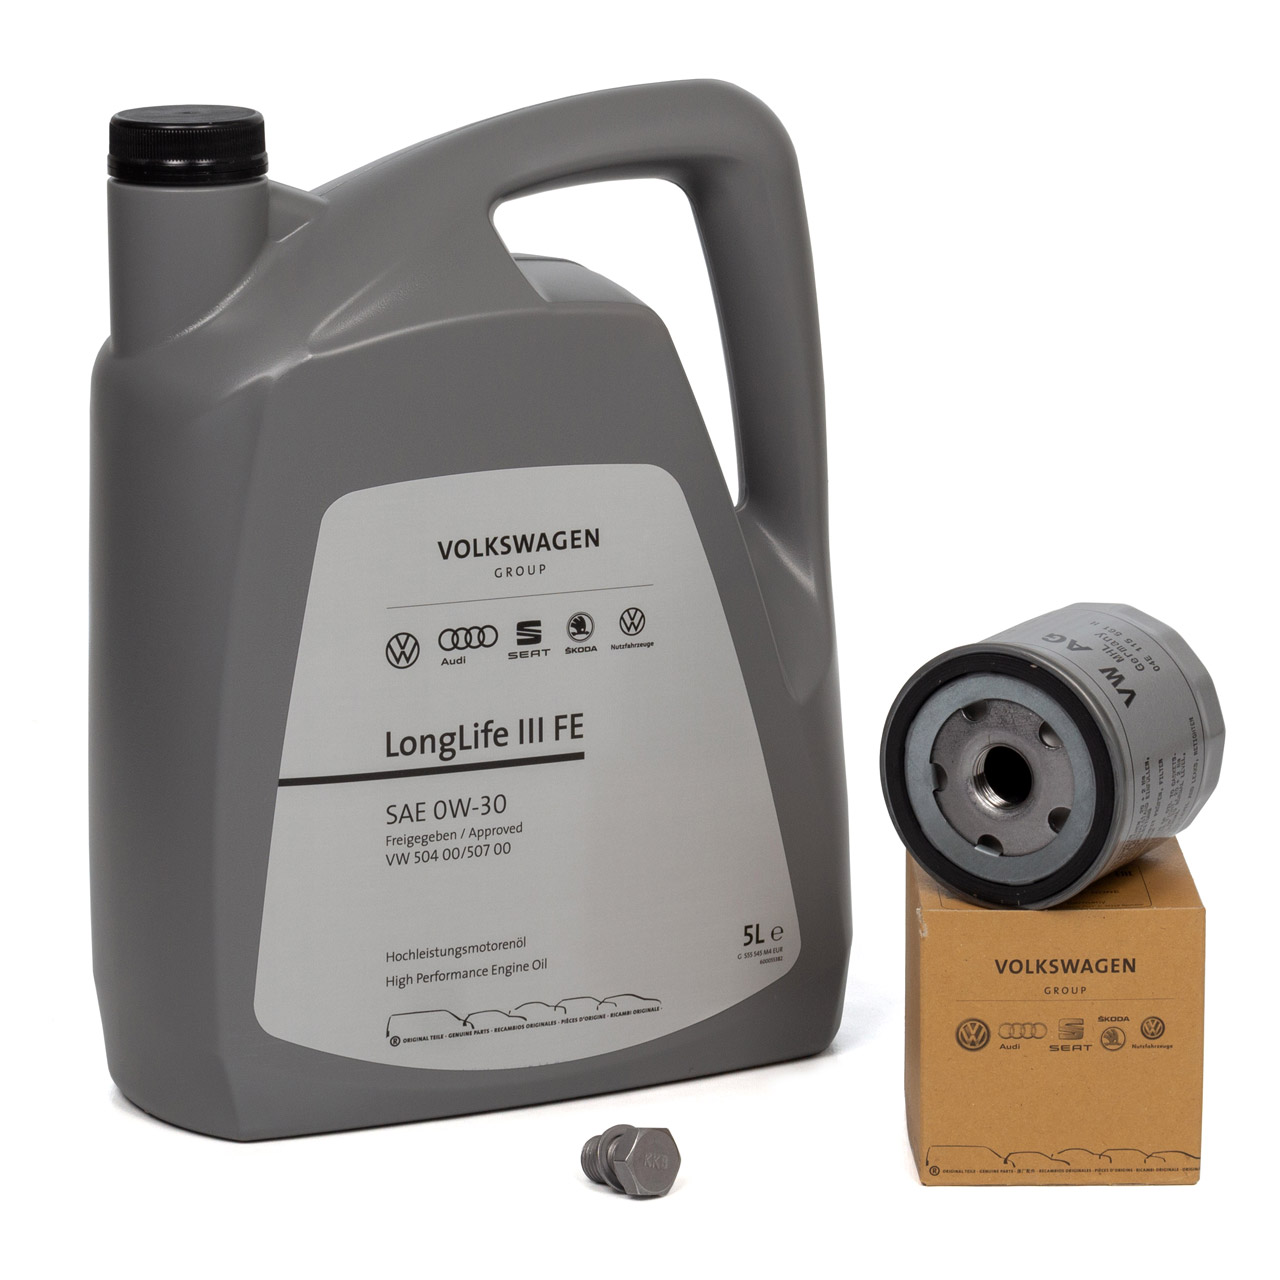 ORIGINAL VW Motoröl Öl 0W30 LONGLIFE III FE 5 L + Ölfilter 04E115561H 1.0-1.4TSI